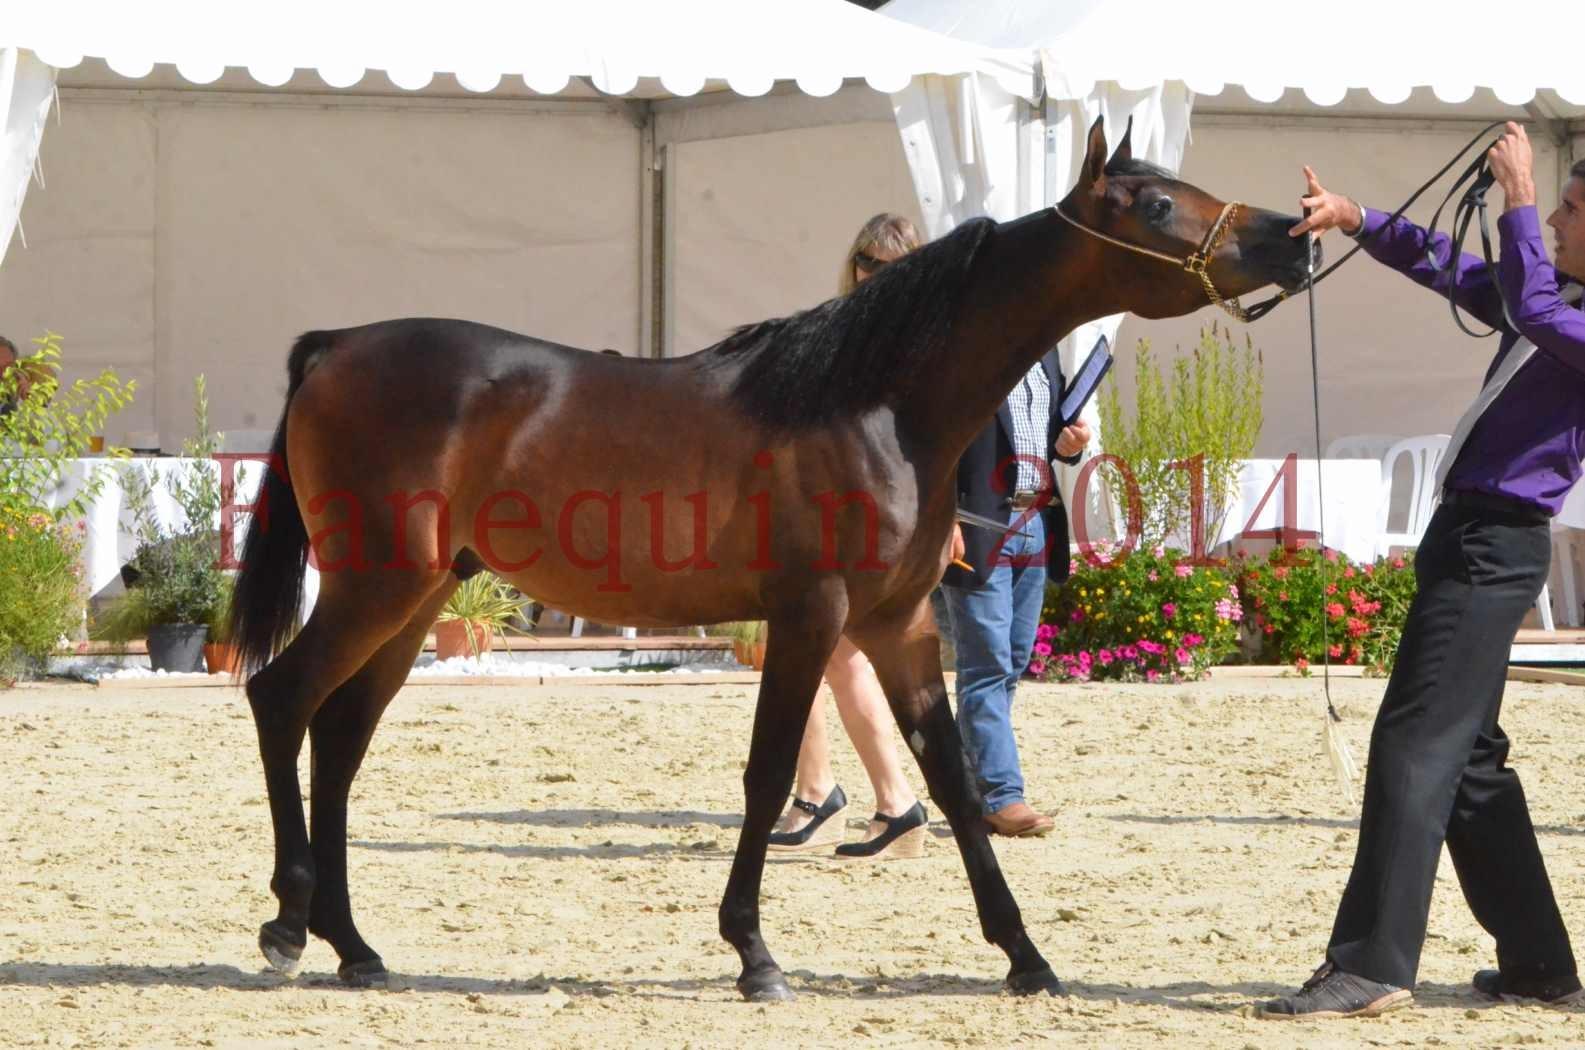 Championnat de FRANCE 2014 - Amateurs - SH FARAJAA - 40